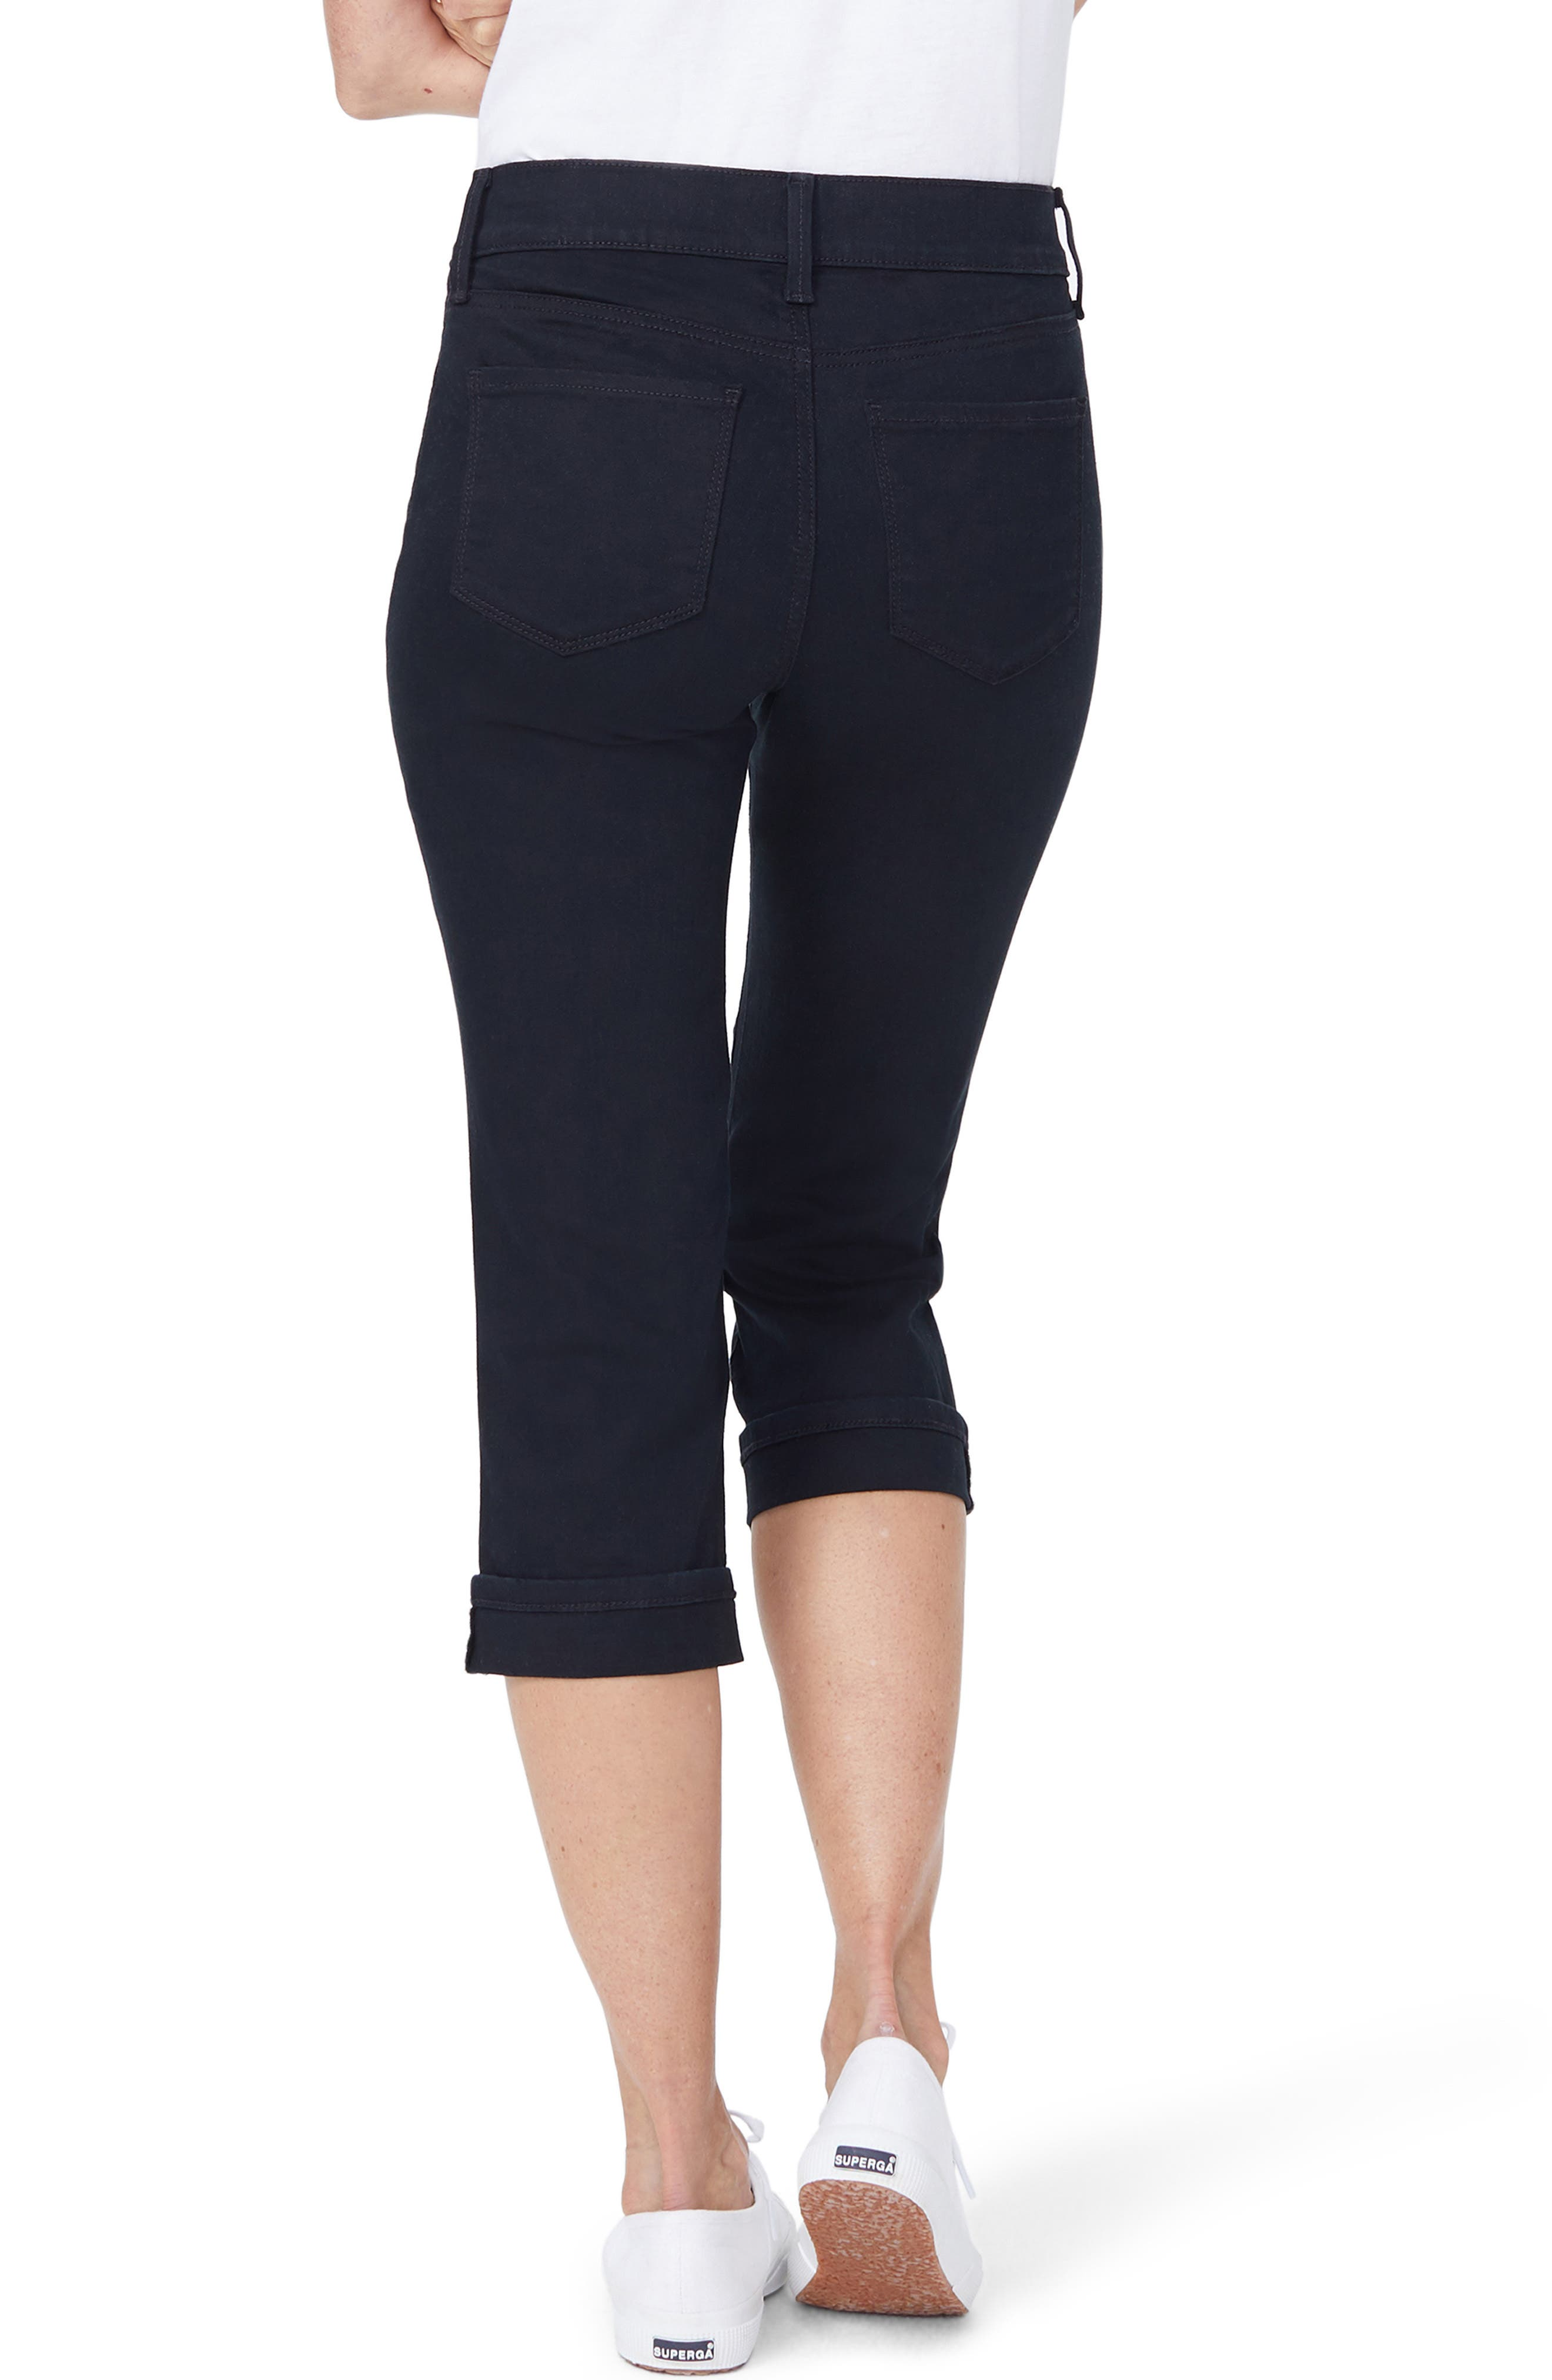 NYDJ, Marilyn Crop Jeans, Alternate thumbnail 2, color, BLACK